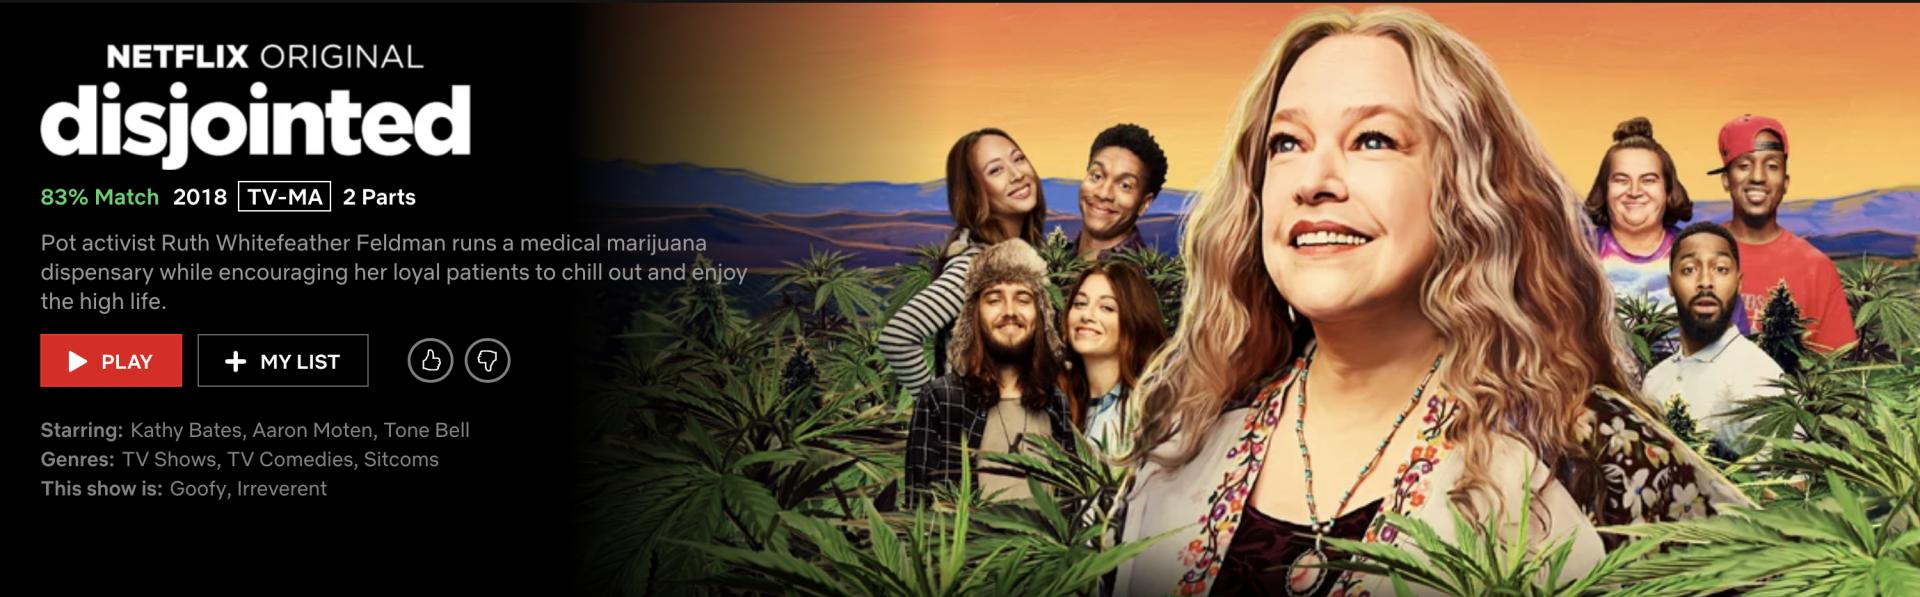 Disjointed – Netflix Original